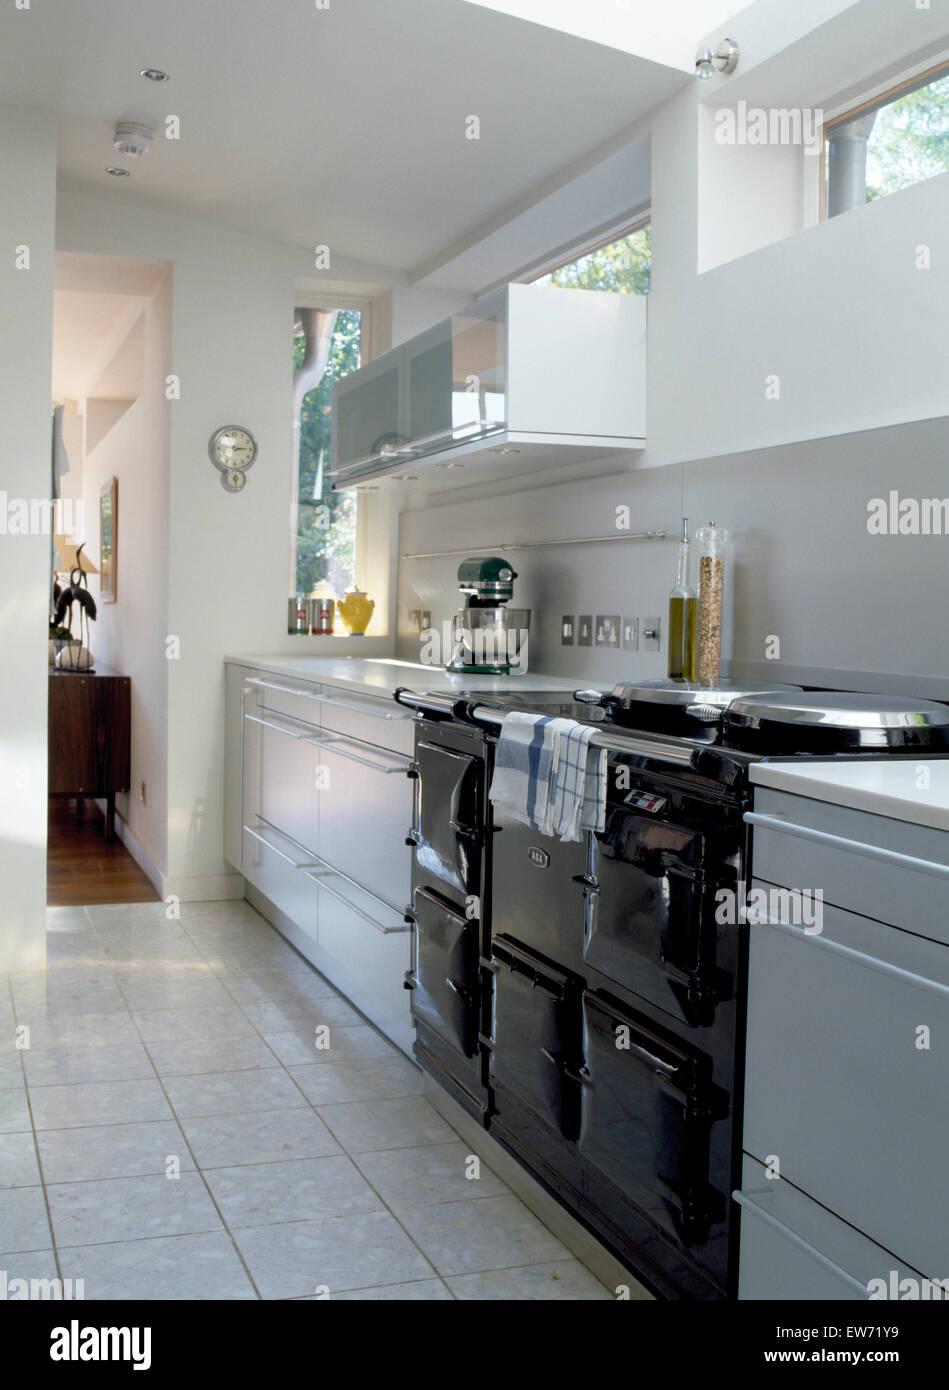 Black Aga Oven In Modern White Kitchen Extension With Chrome Mixer On Stock Photo Alamy